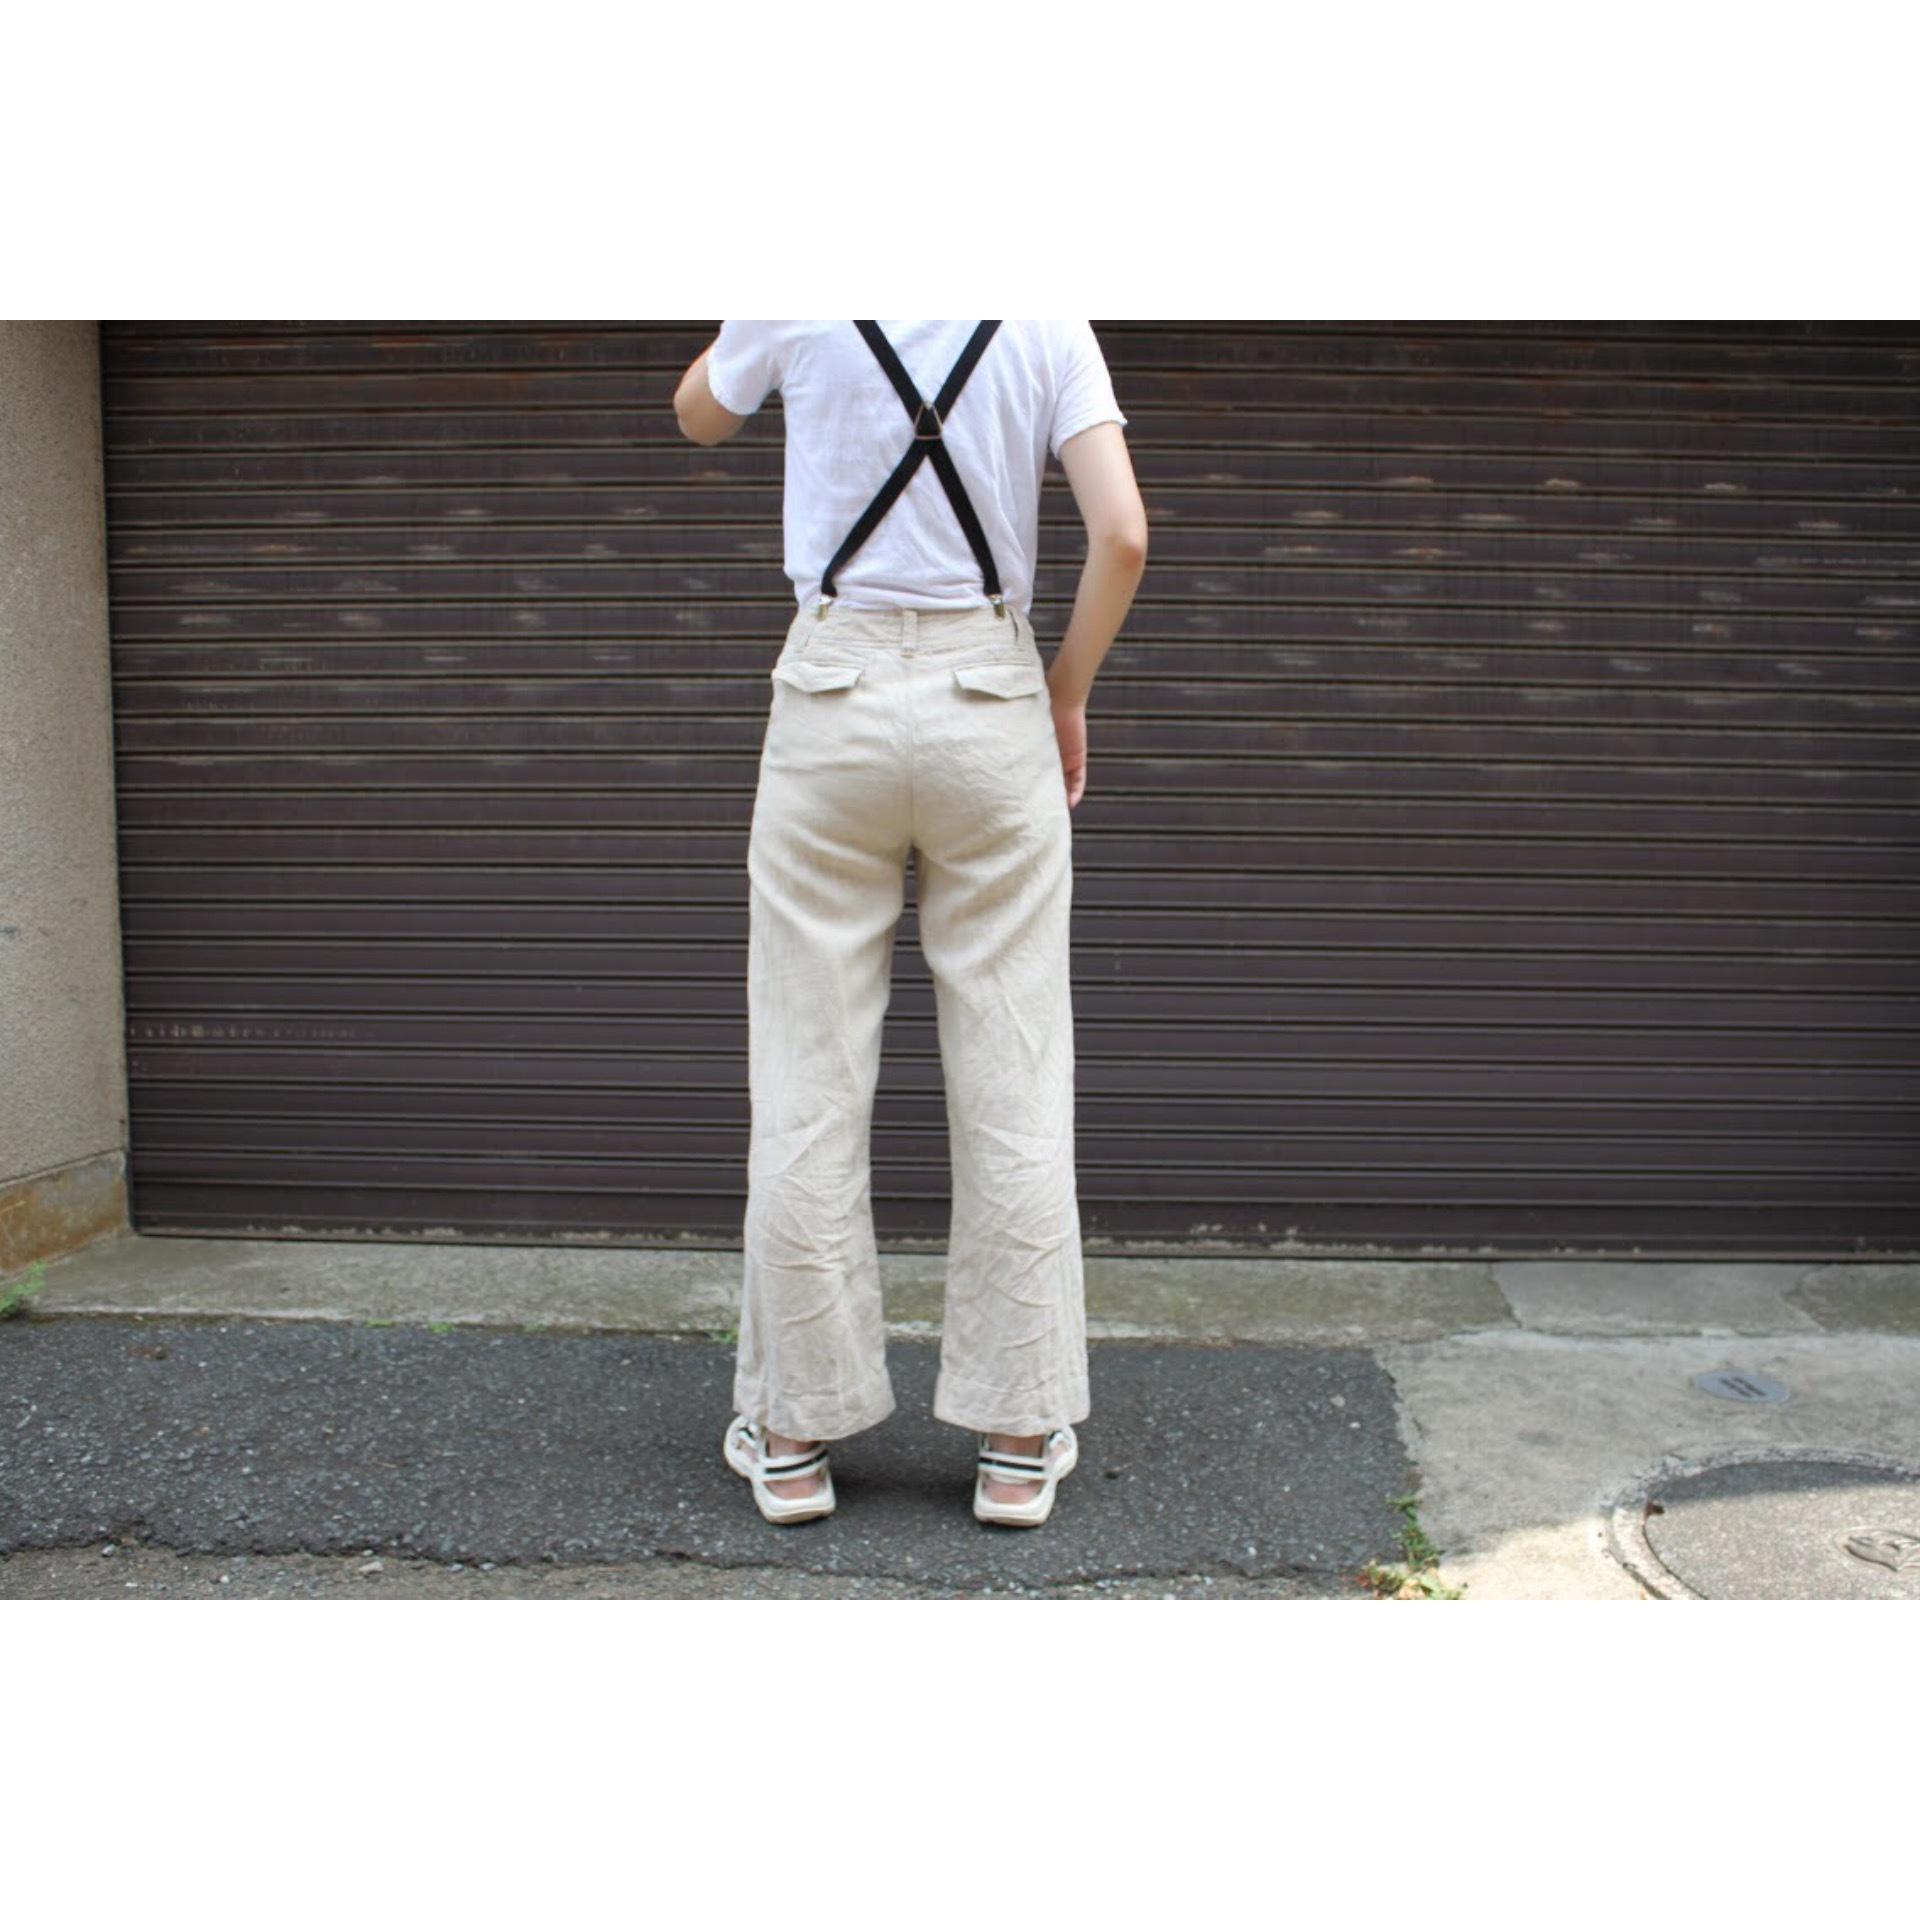 Vintage linen pants by Eddie Bauer